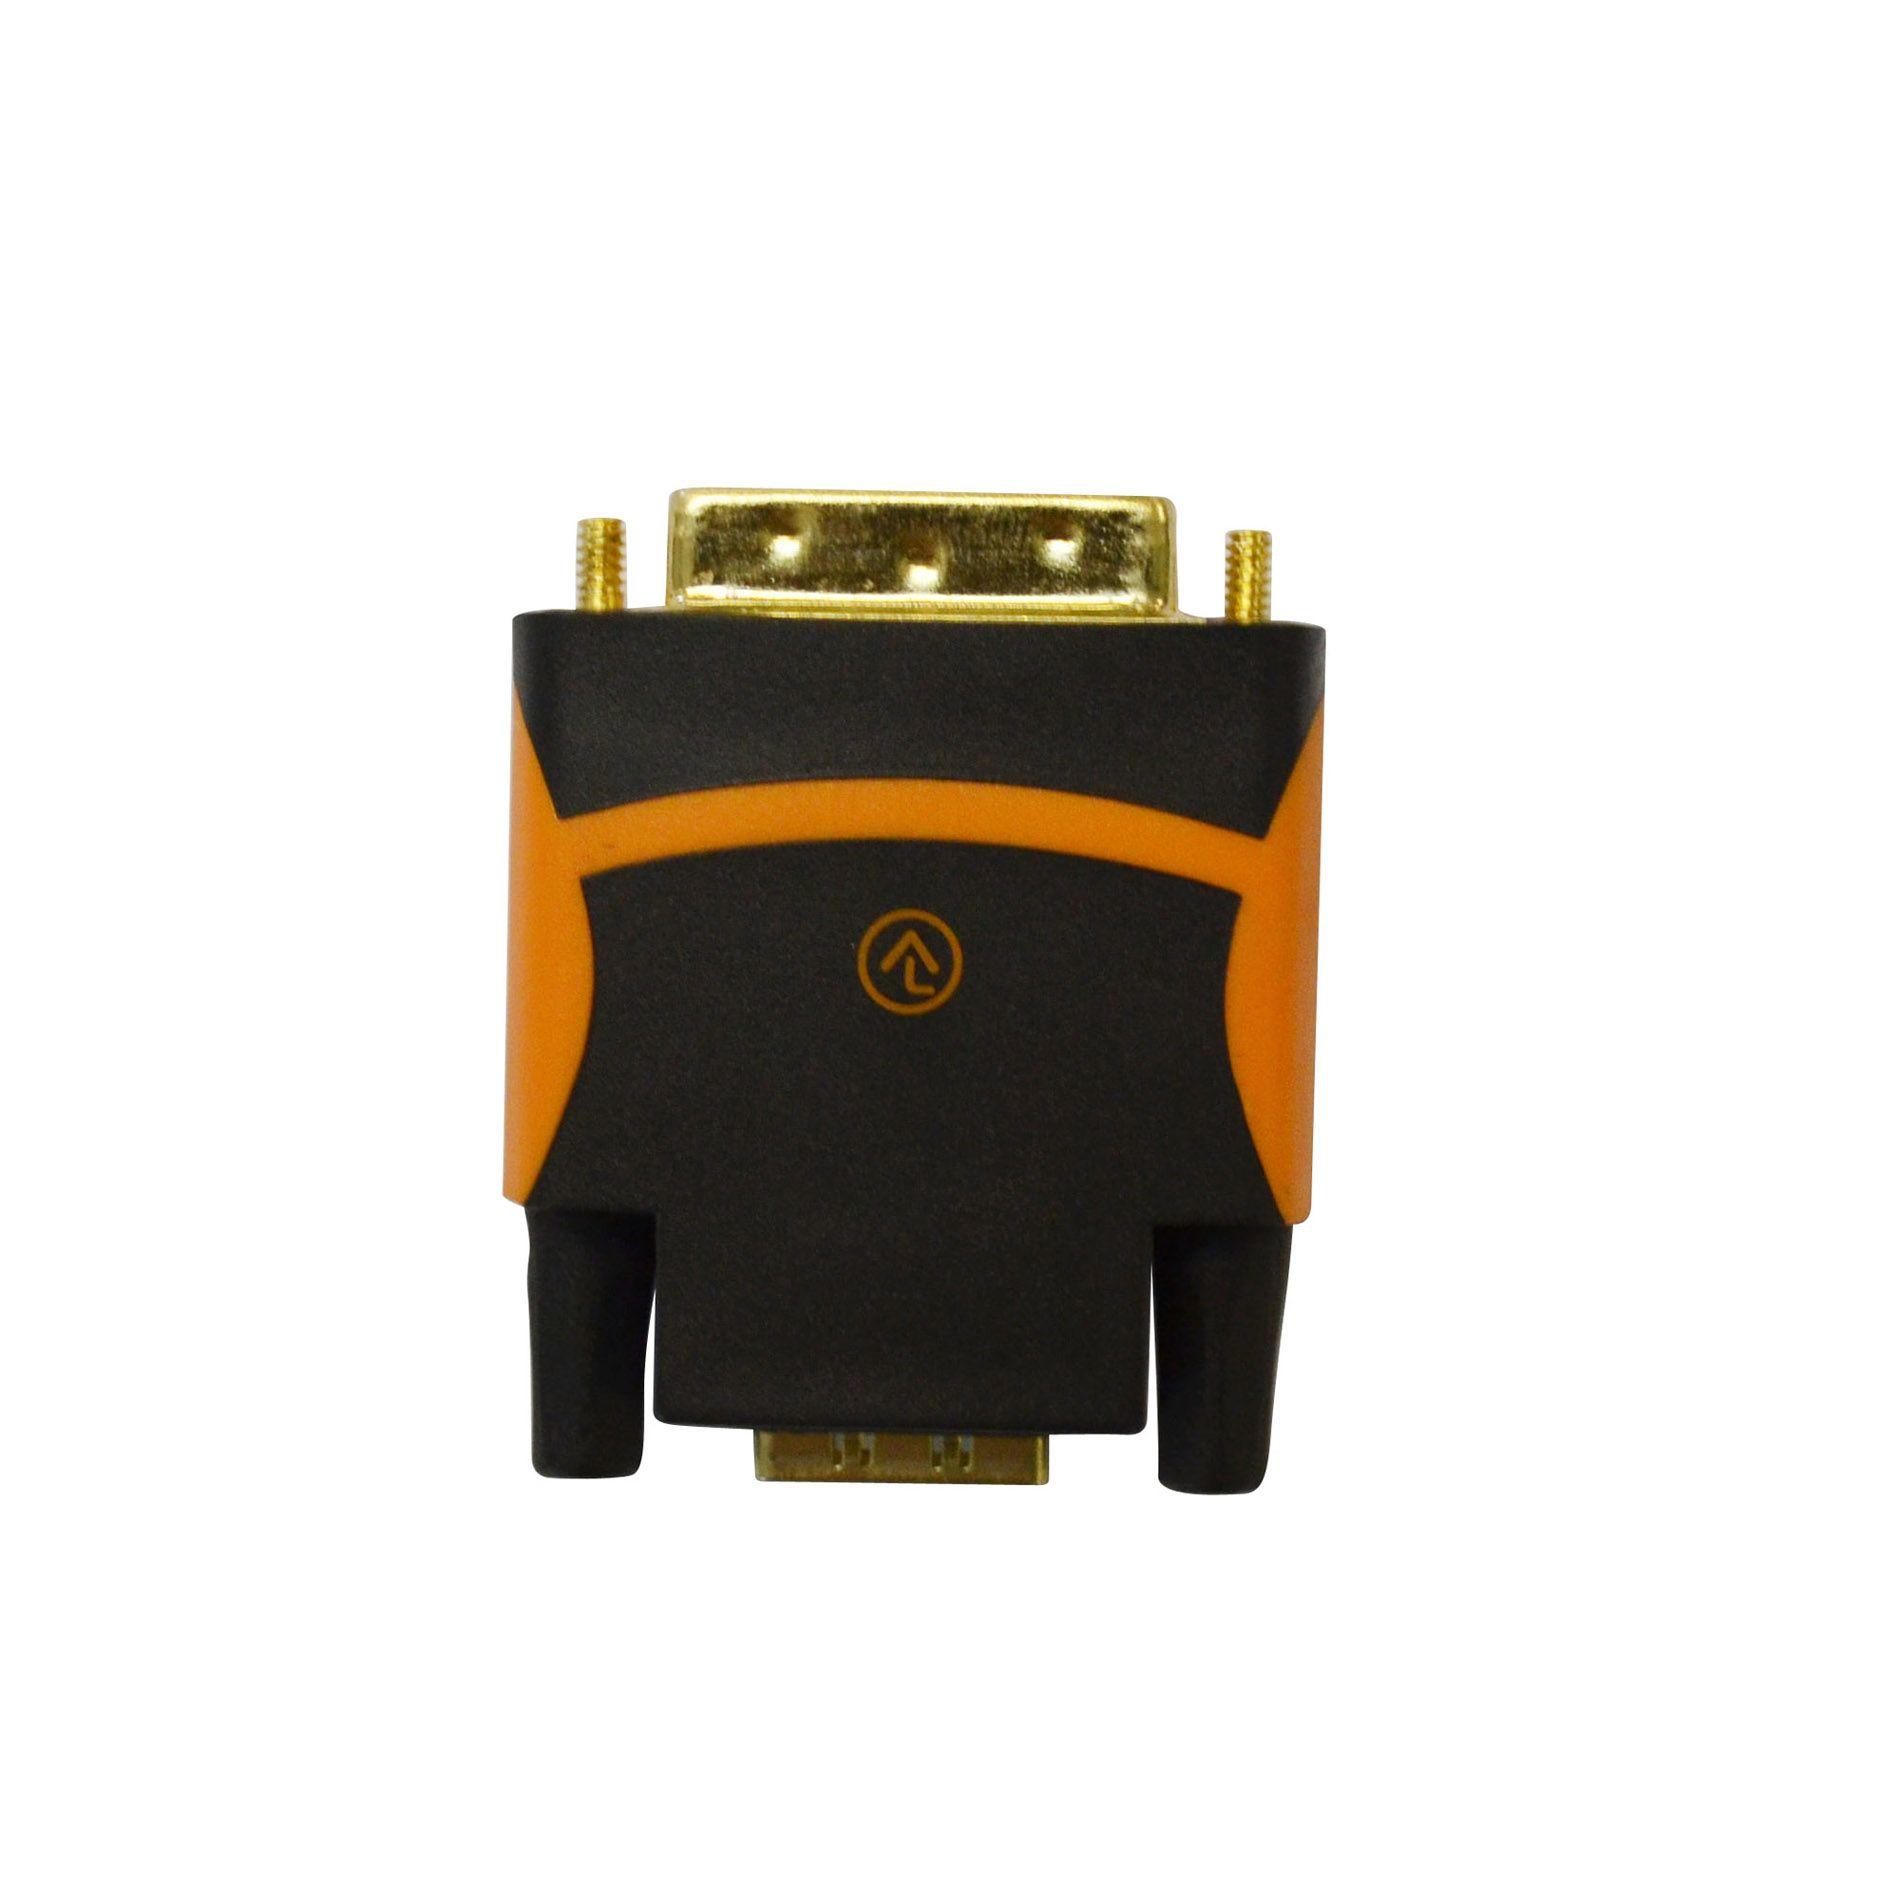 Alphaline™ HDMI to DVI Adapter